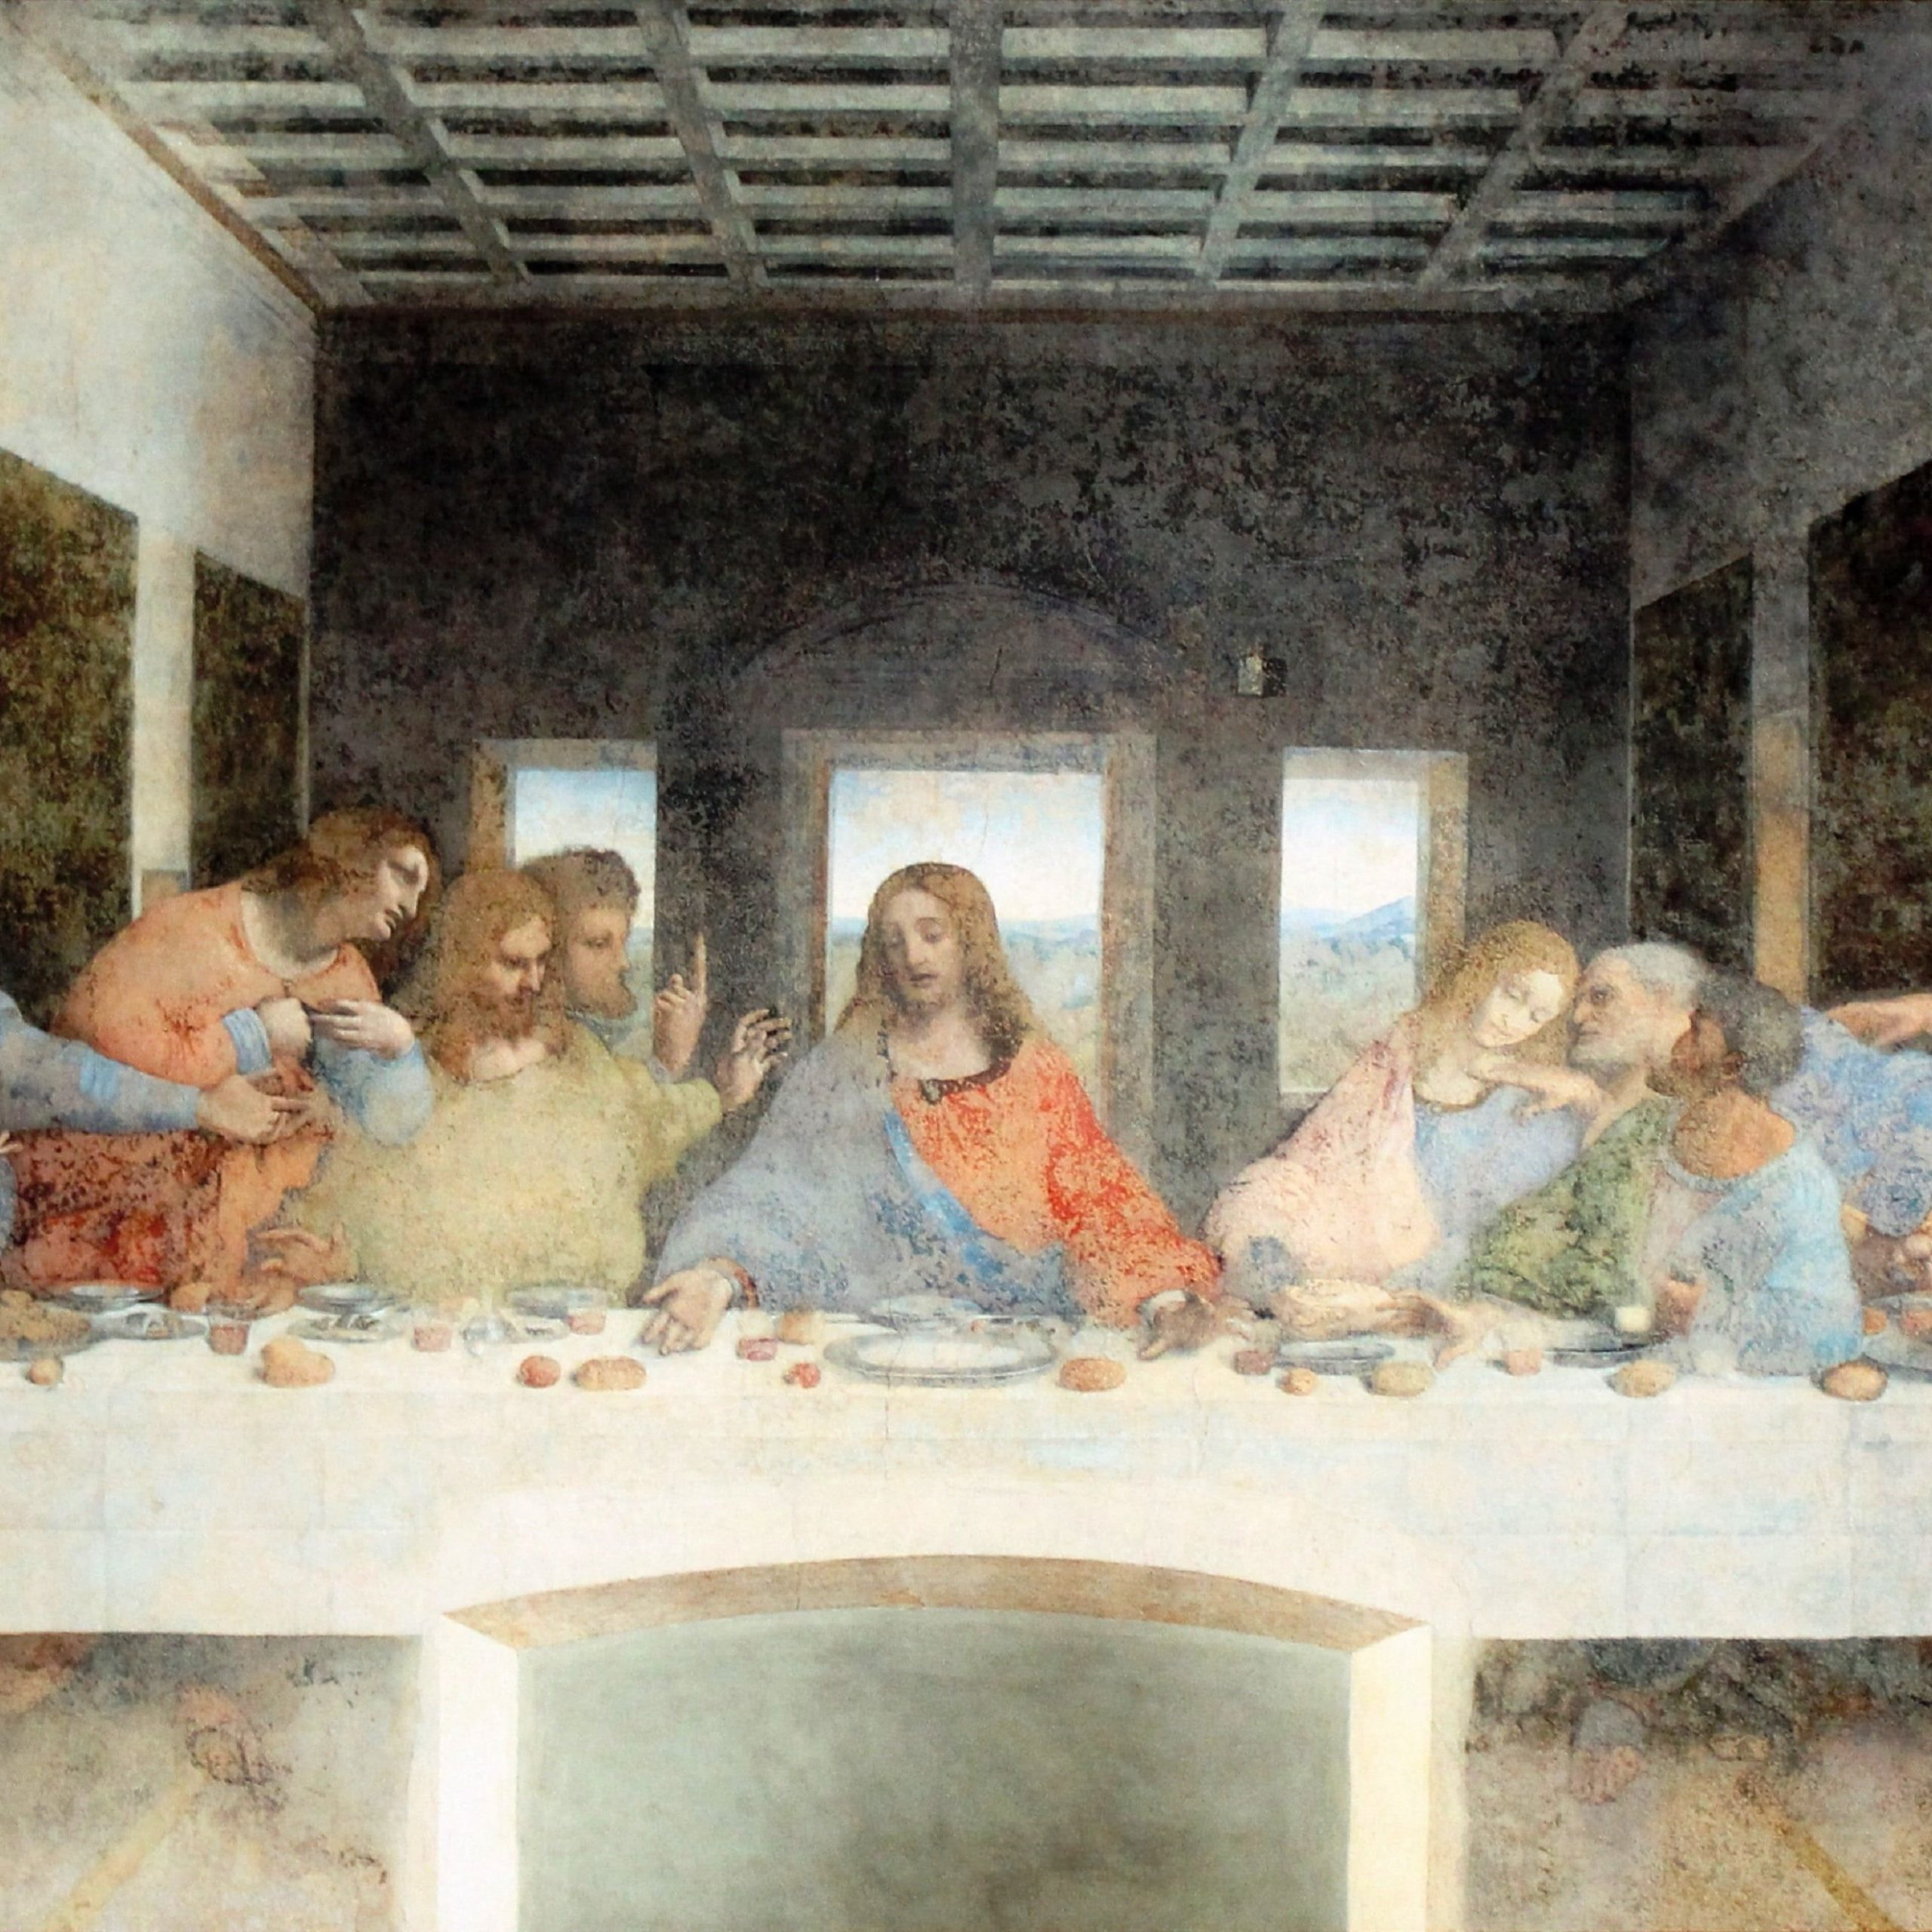 The Last Supper Paintingleonardo Da Vinci #painting Last Pertaining To 2020 Blended Fabric Leonardo Davinci The Last Supper Wall Hangings (View 5 of 20)